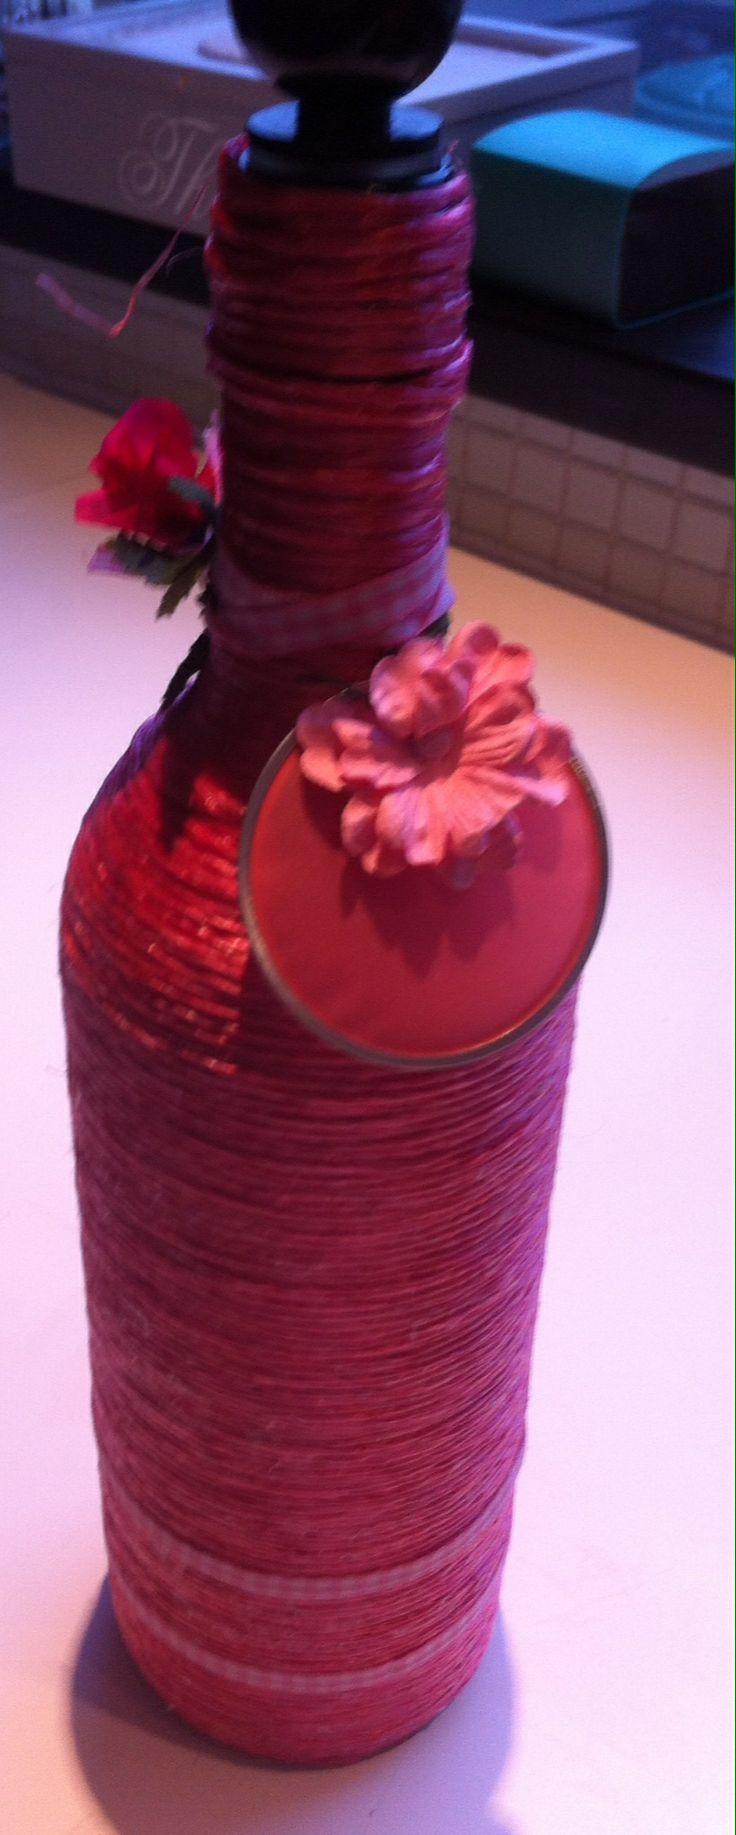 Fles gewikkeld in cisal touw